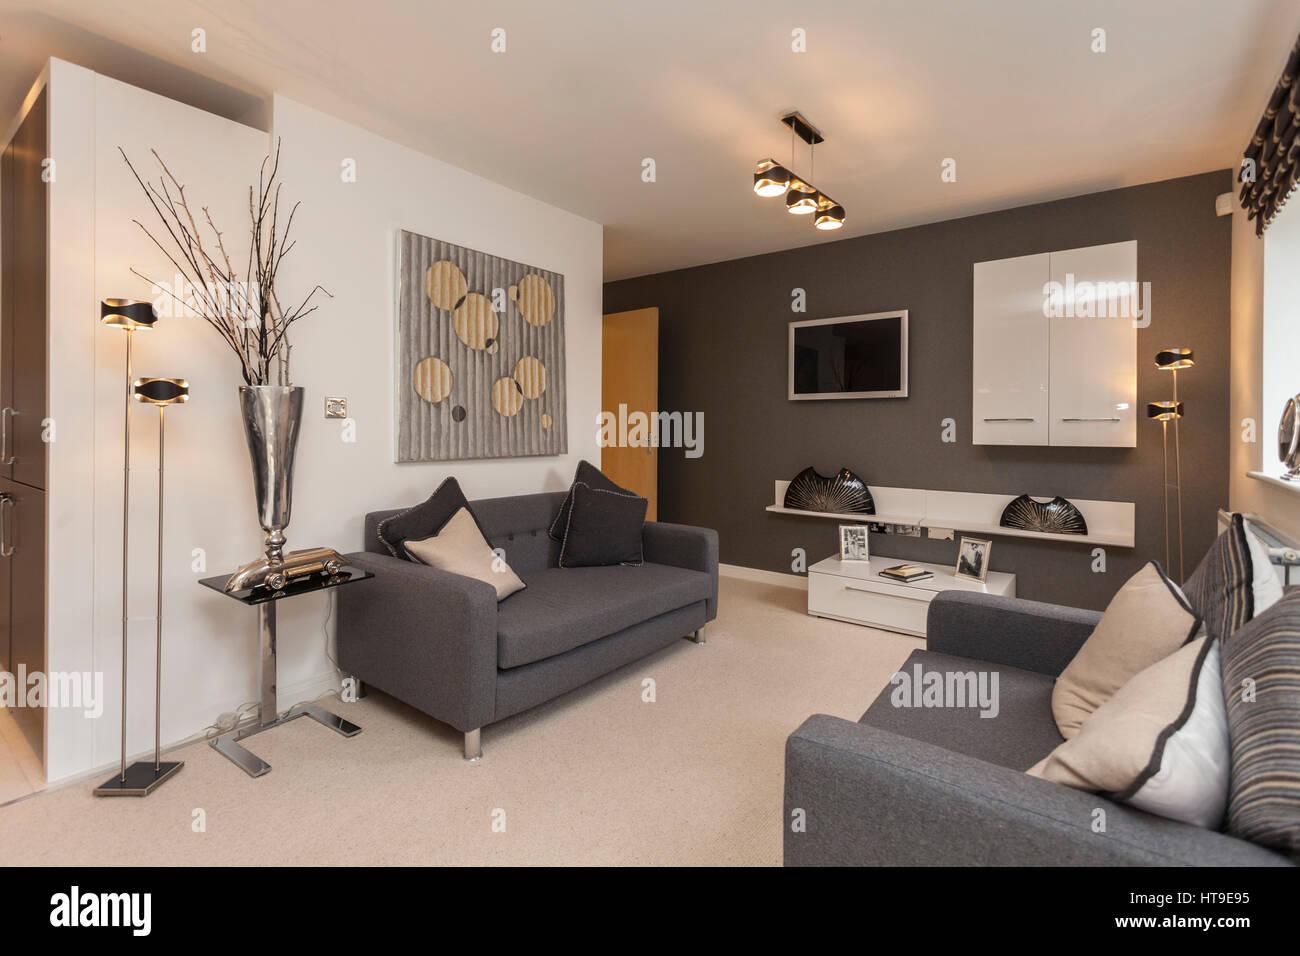 Home Interior Modern Lounge New Build Grey Sofa Cream Carpet Stock Photo Alamy